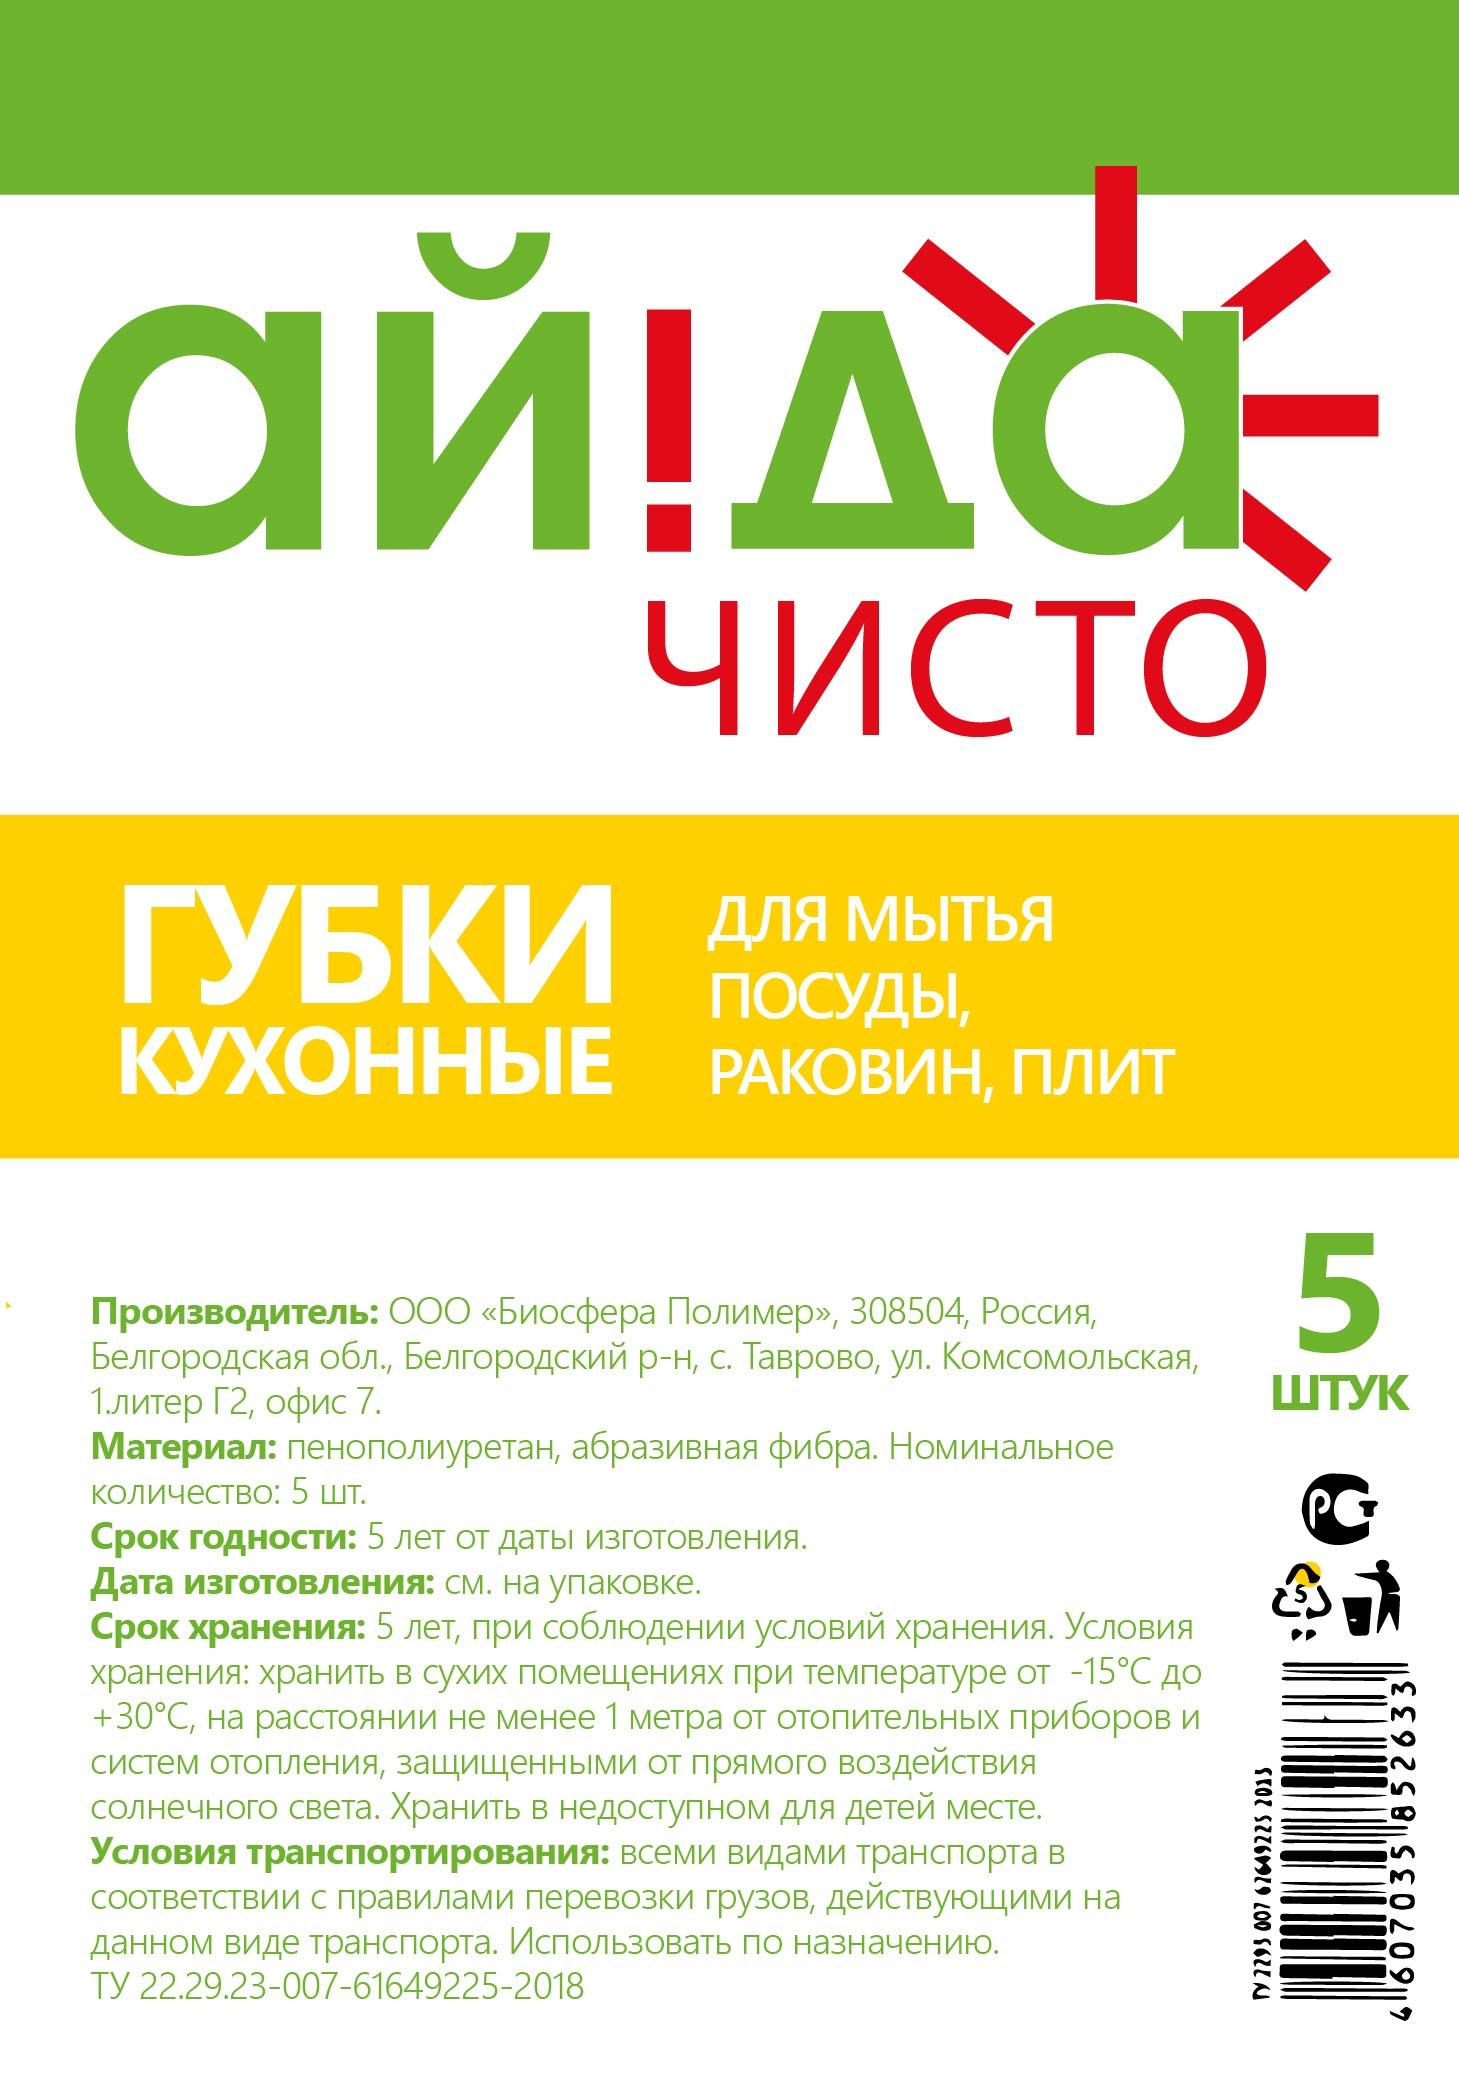 Дизайн логотипа и упаковки СТМ фото f_5105c5eede826617.jpg